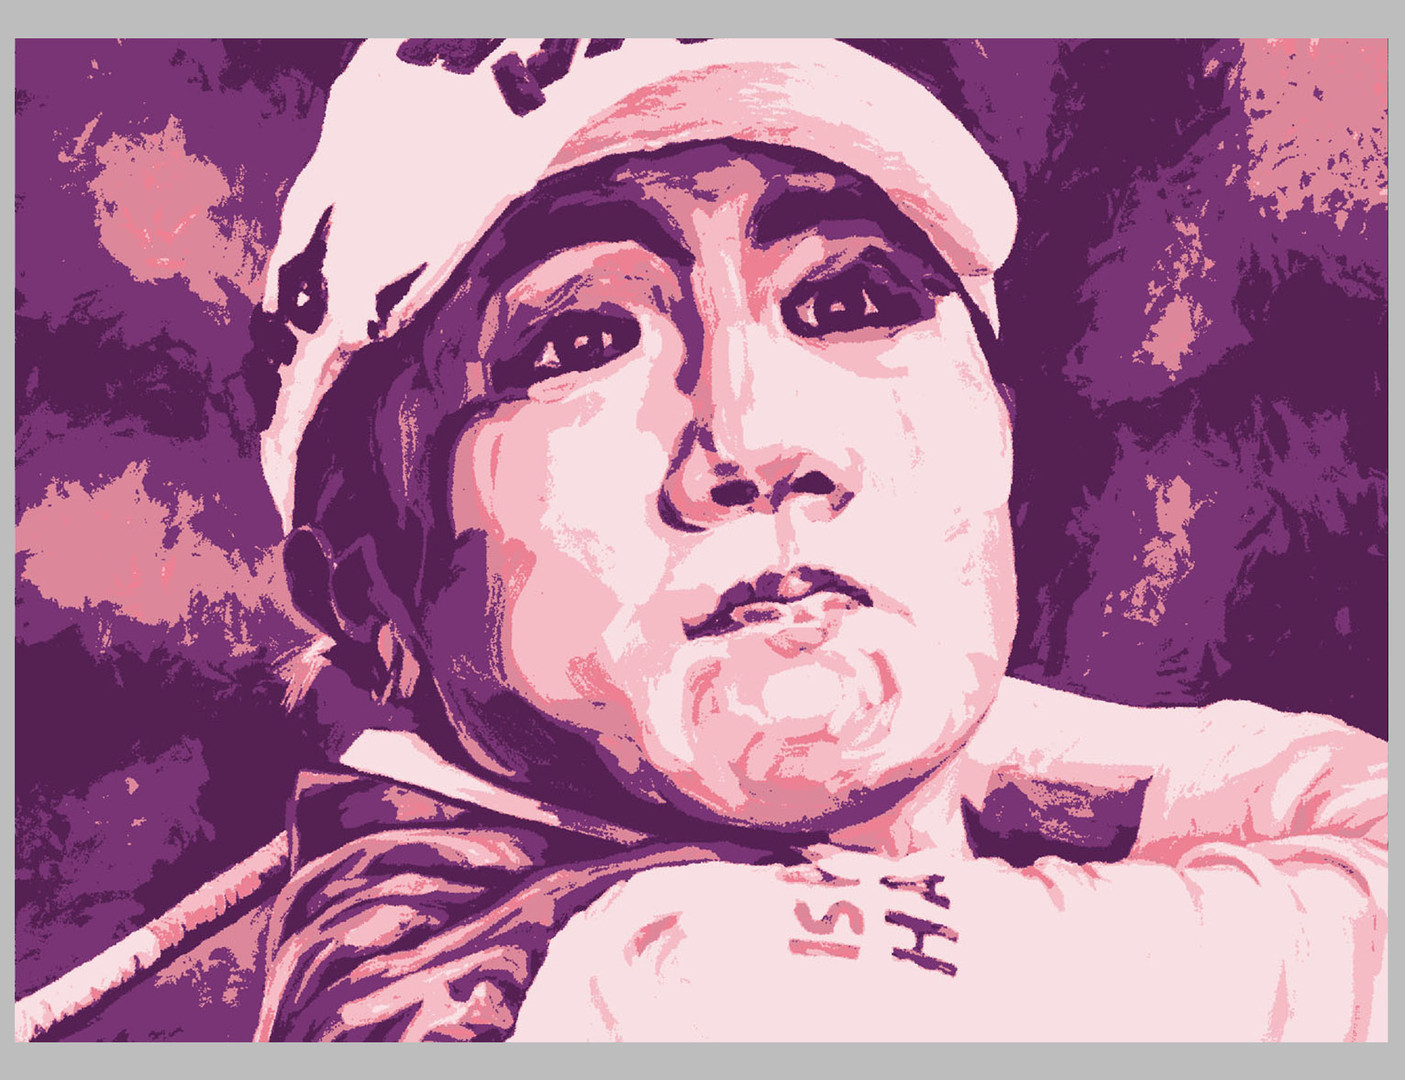 Giclée-Lydia Ko-DUO-01.jpg